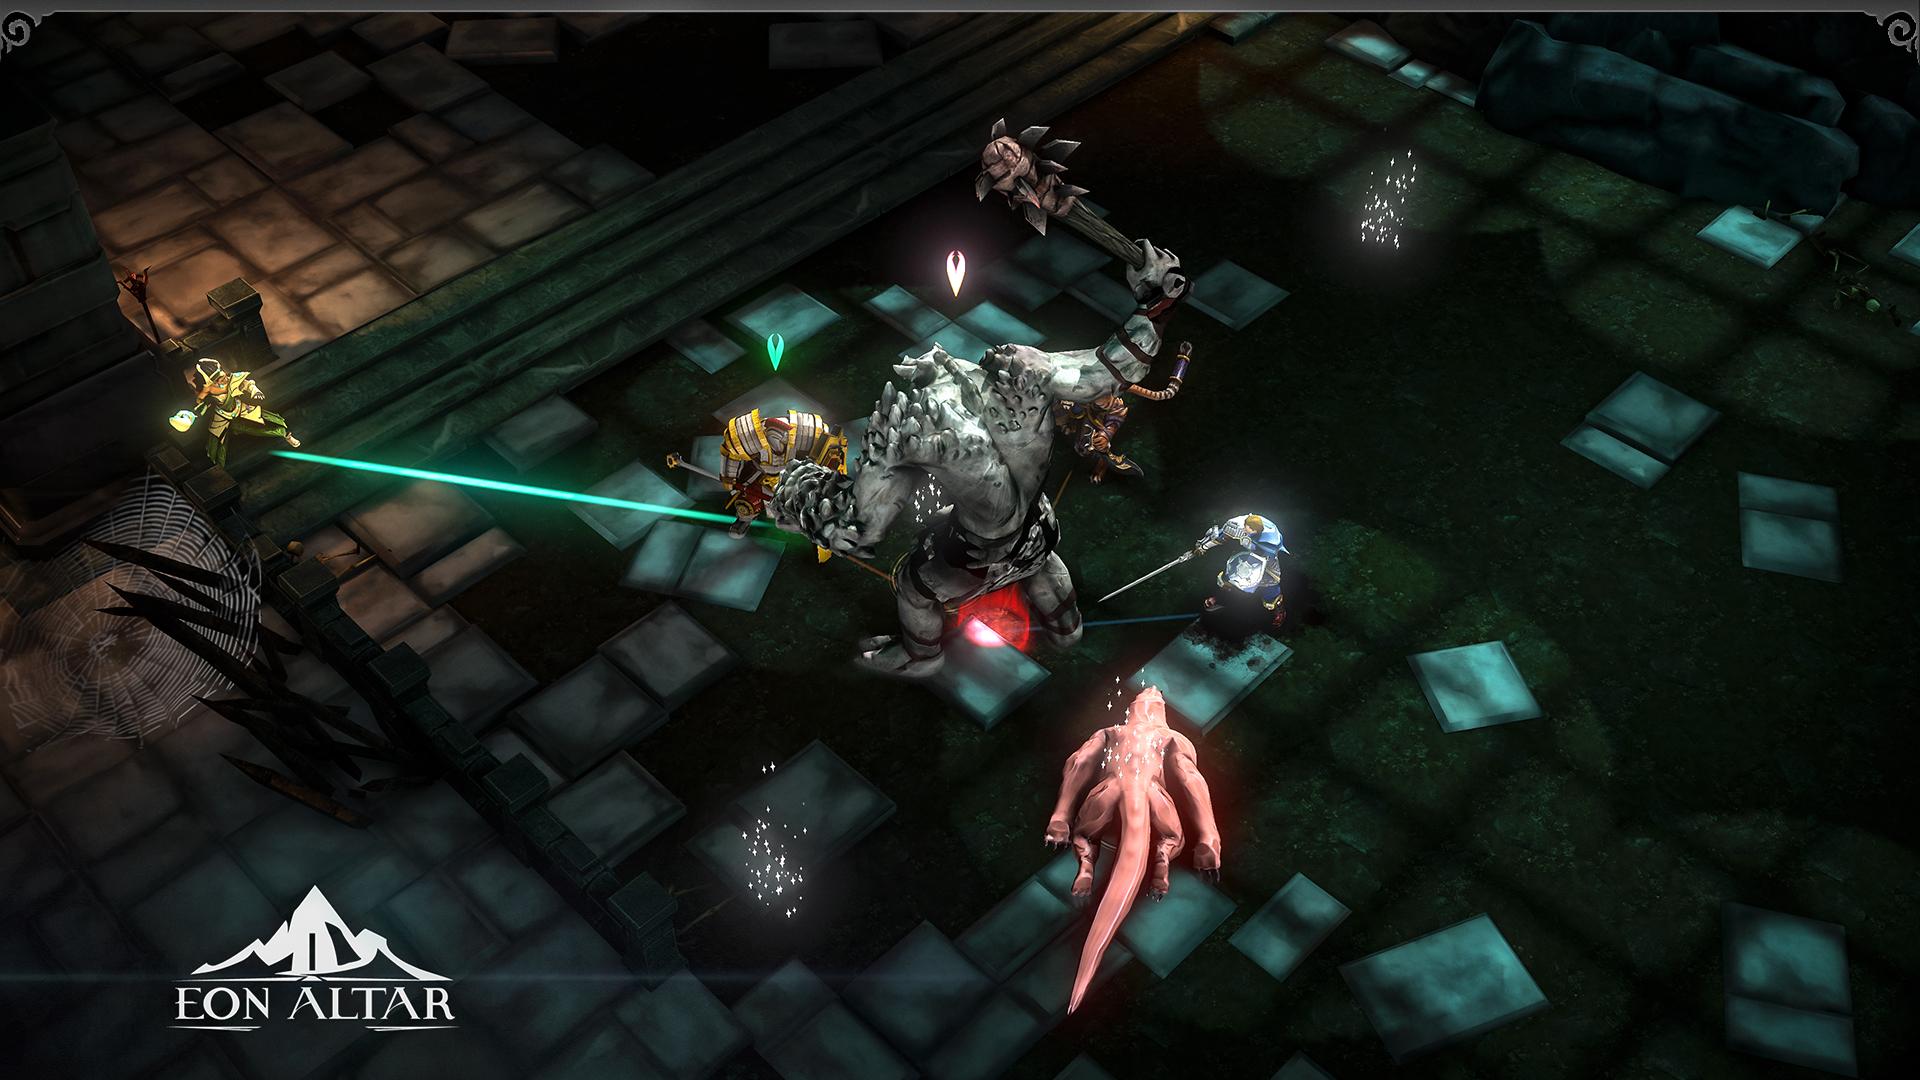 Eon Altar screenshot